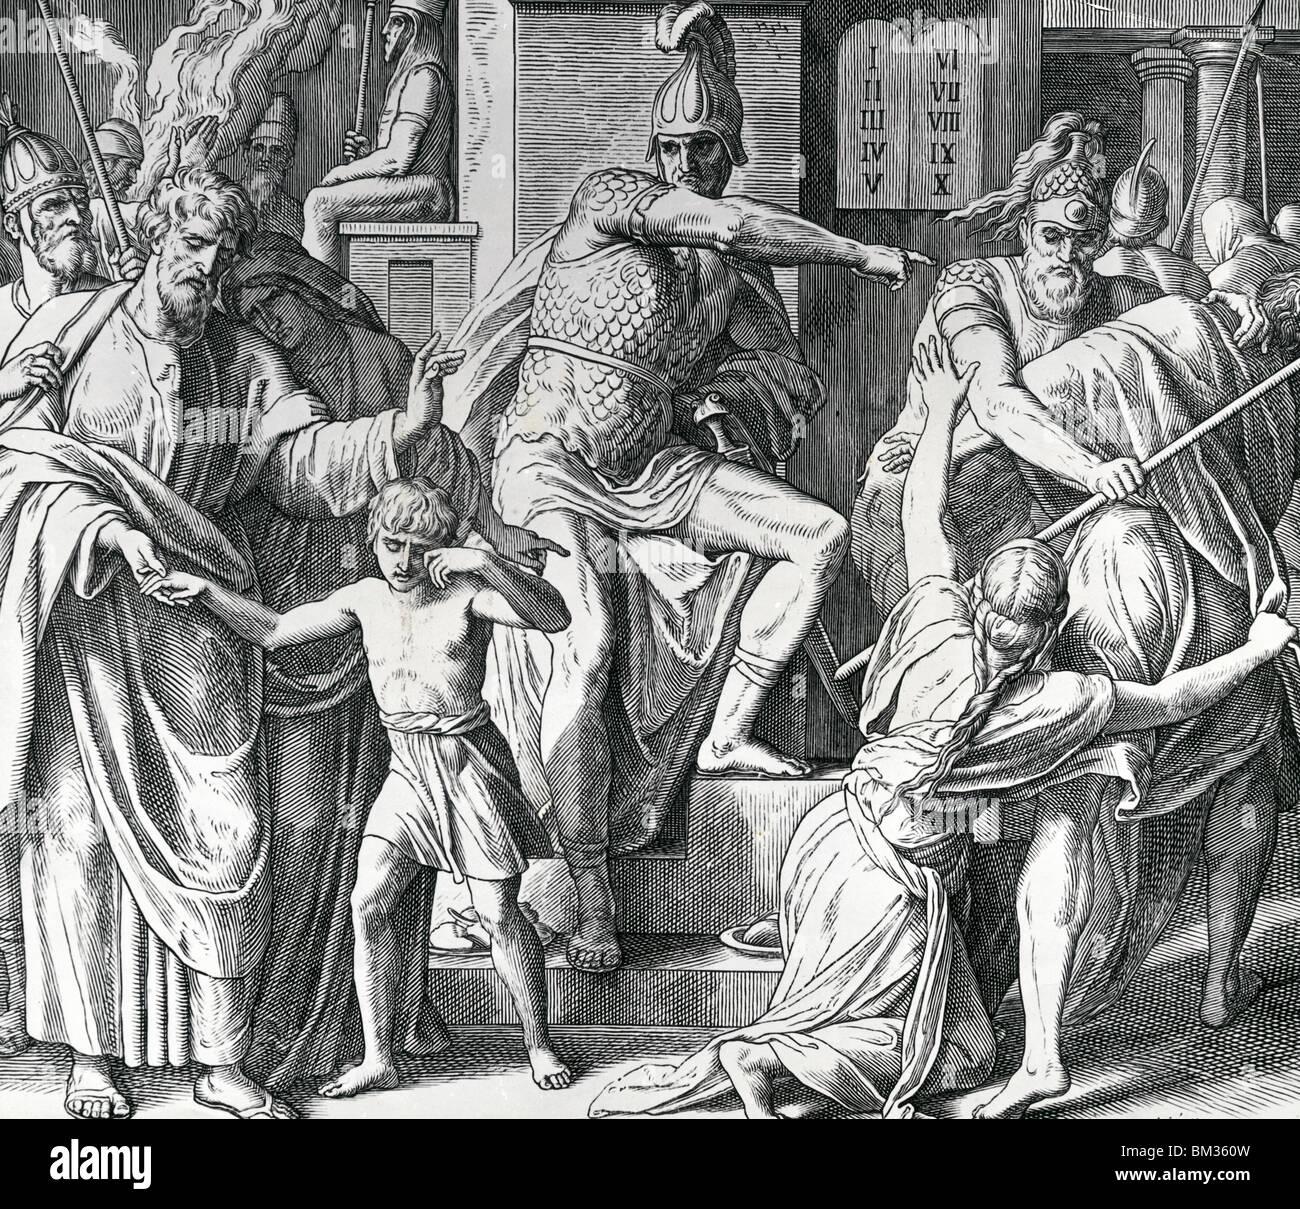 Antiochus Persecution of Israelites by Julius Schnorr von Carolsfeld, illustration, (1794-1872) - Stock Image